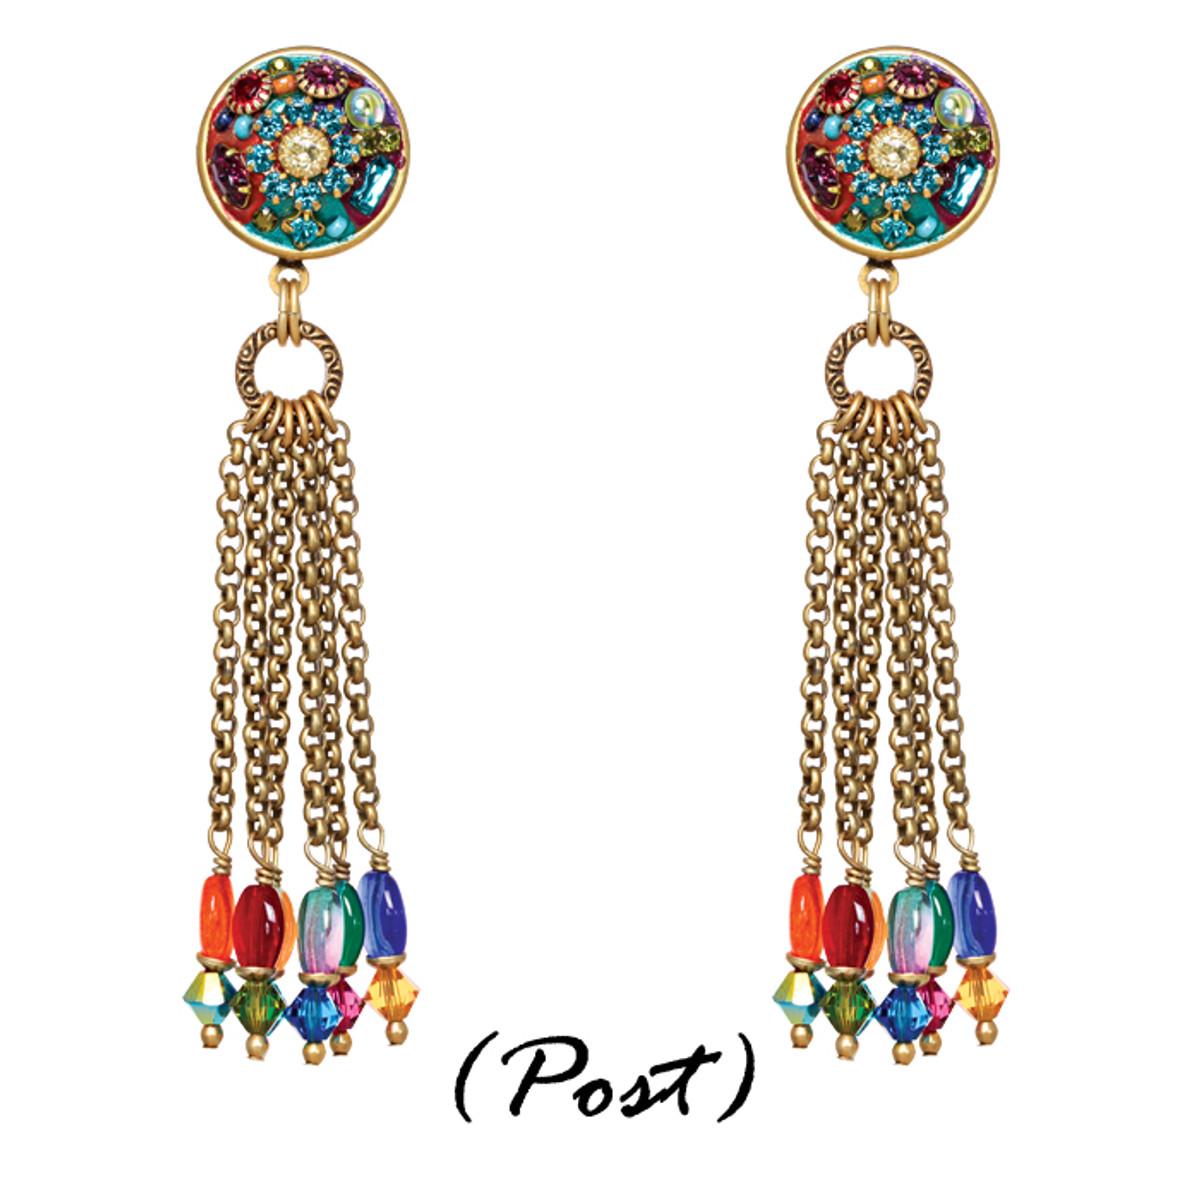 Michal Golan Earrings - Multibright Round Pendant With Tassel